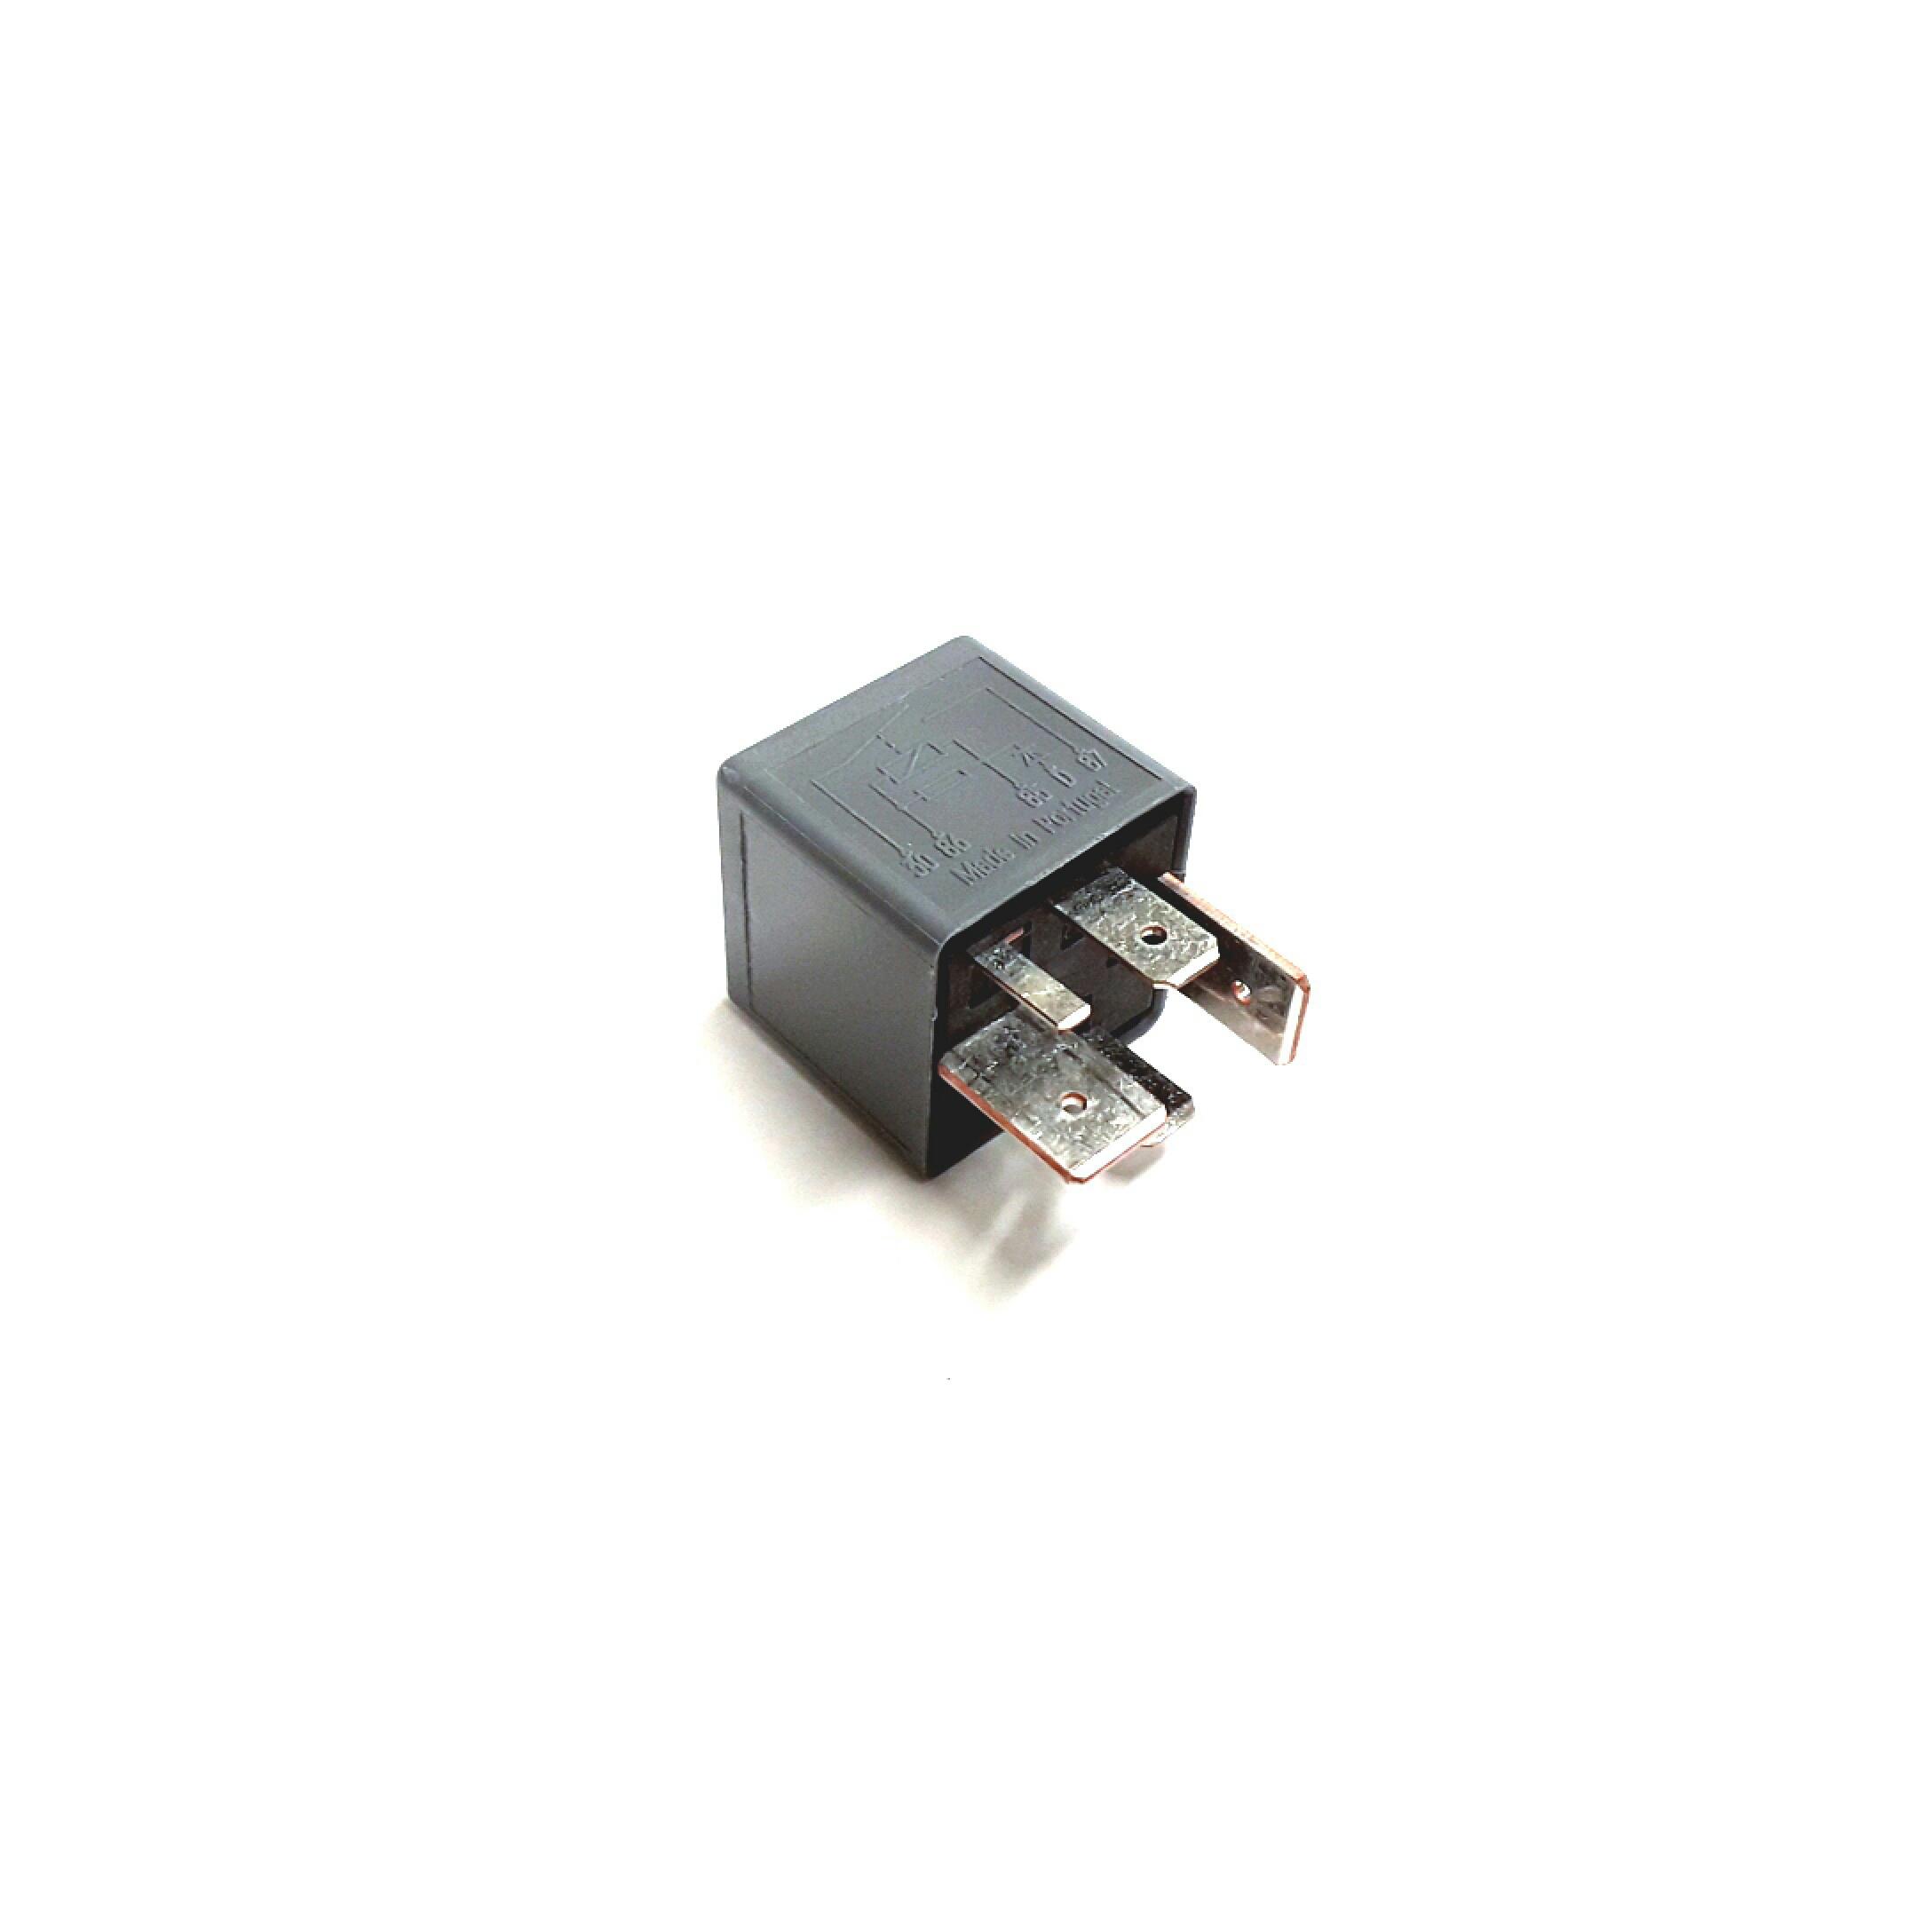 1k0906381 - Accessory Power Relay  Powertrain Control Module Relay